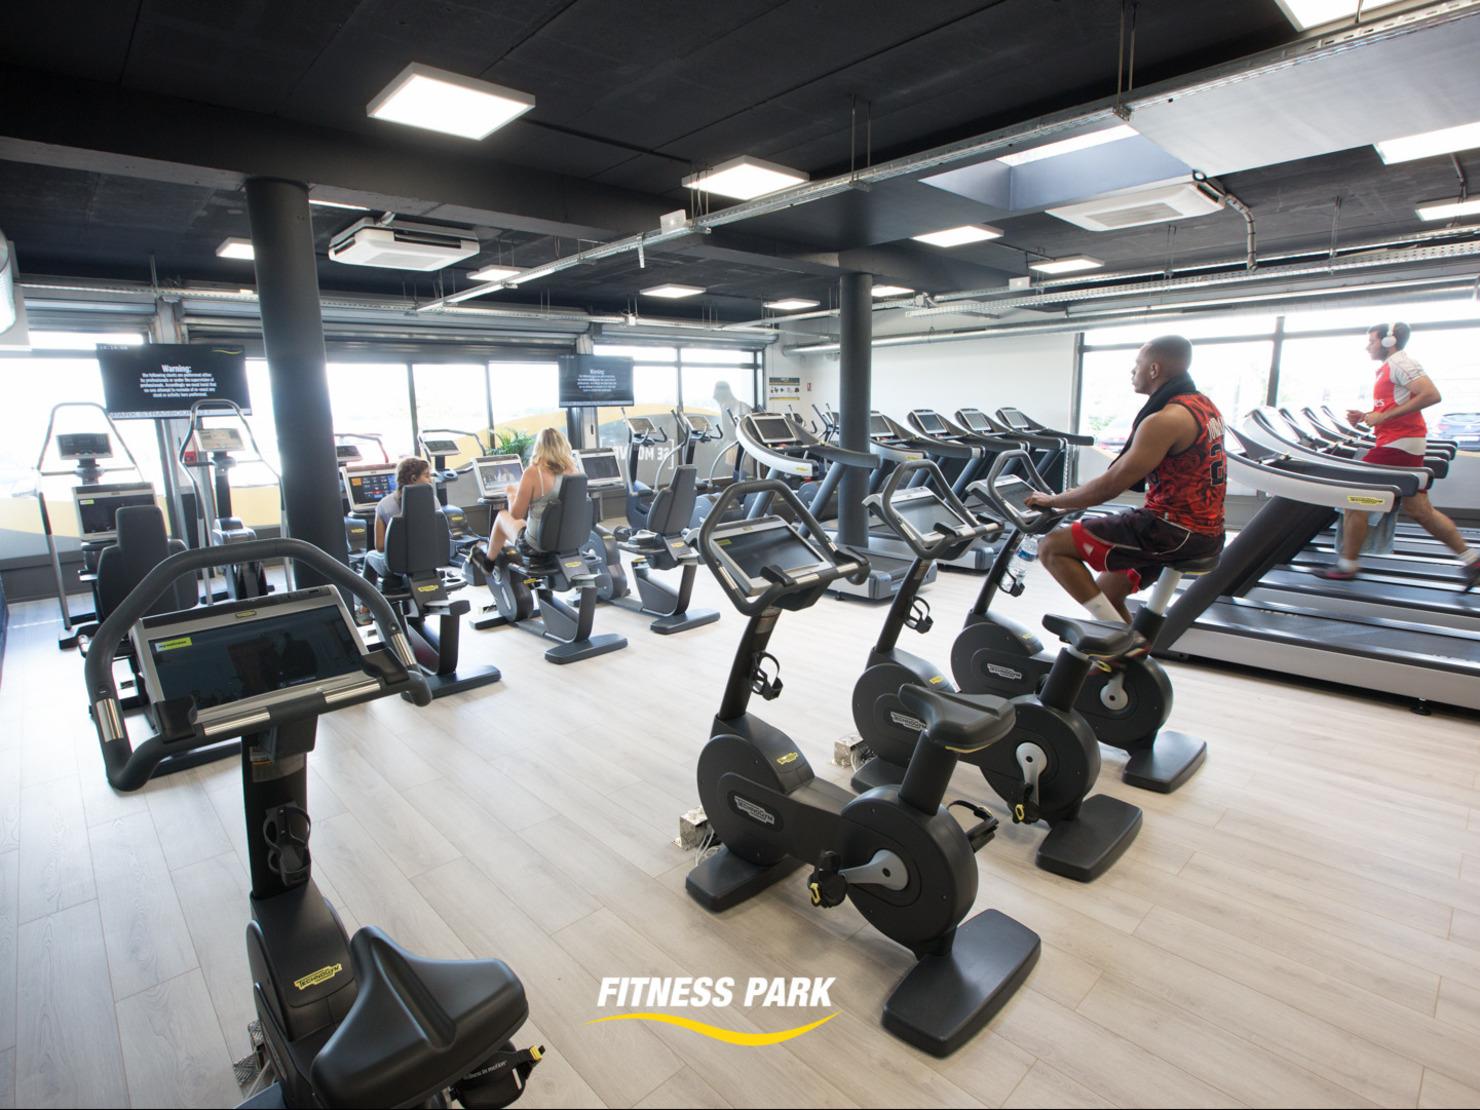 fitness park strasbourg lampertheim tarifs avis horaires essai gratuit. Black Bedroom Furniture Sets. Home Design Ideas